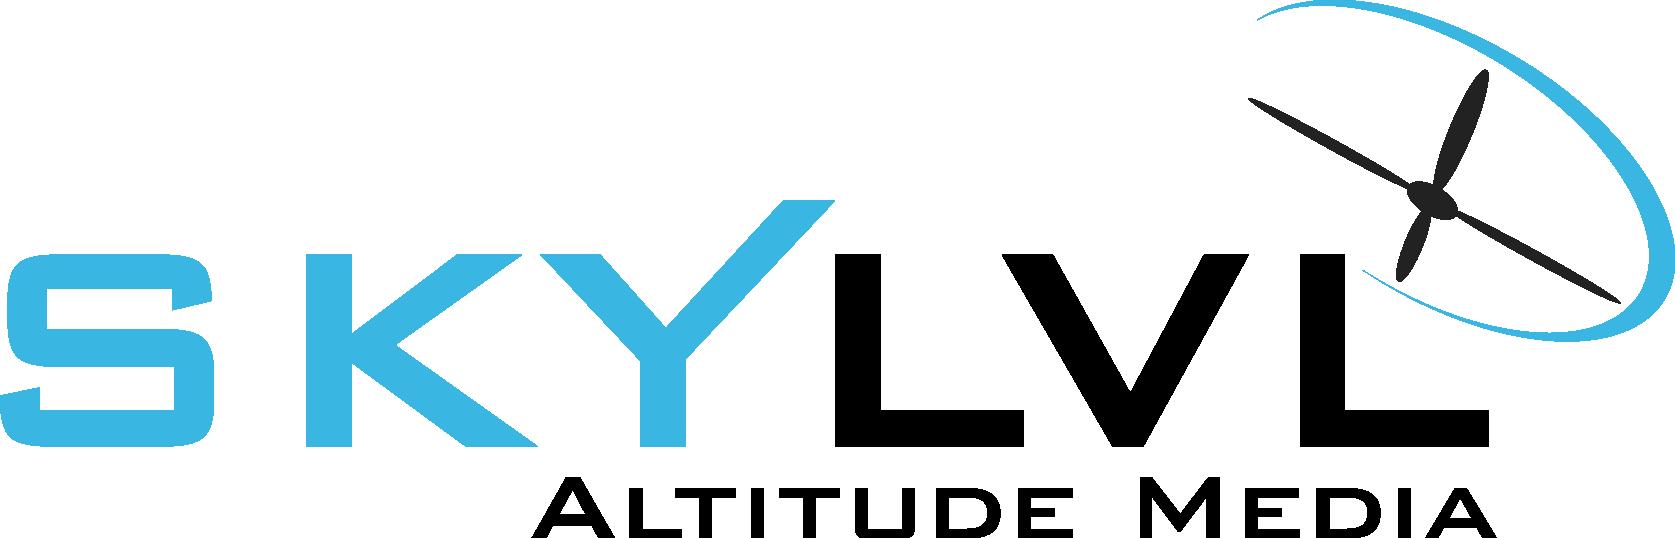 SkyLVL Altitude Media